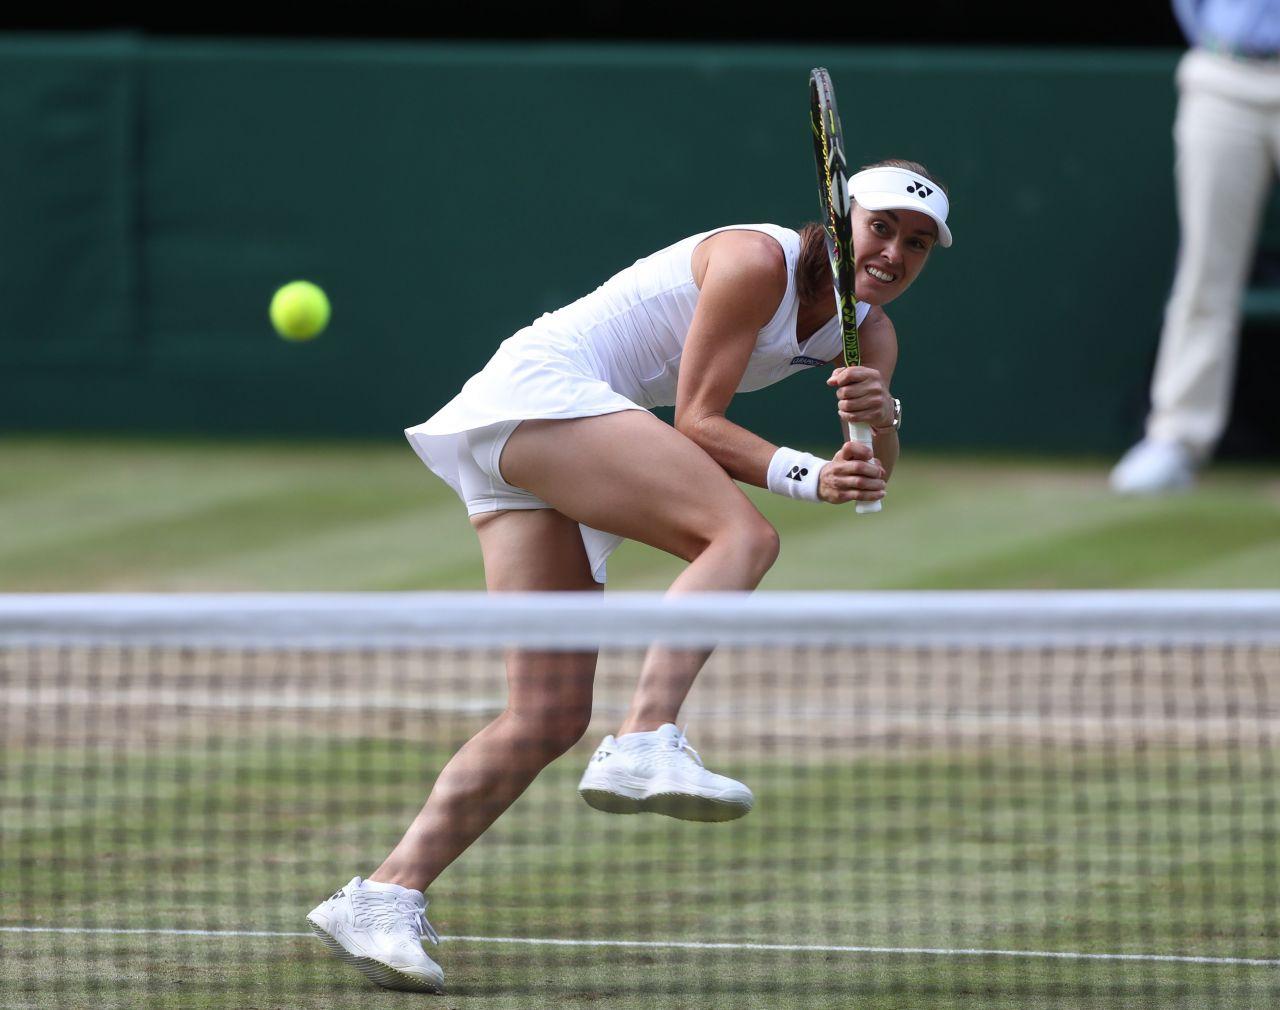 Hingis Wimbledon Tennis Championships 07 13 2017